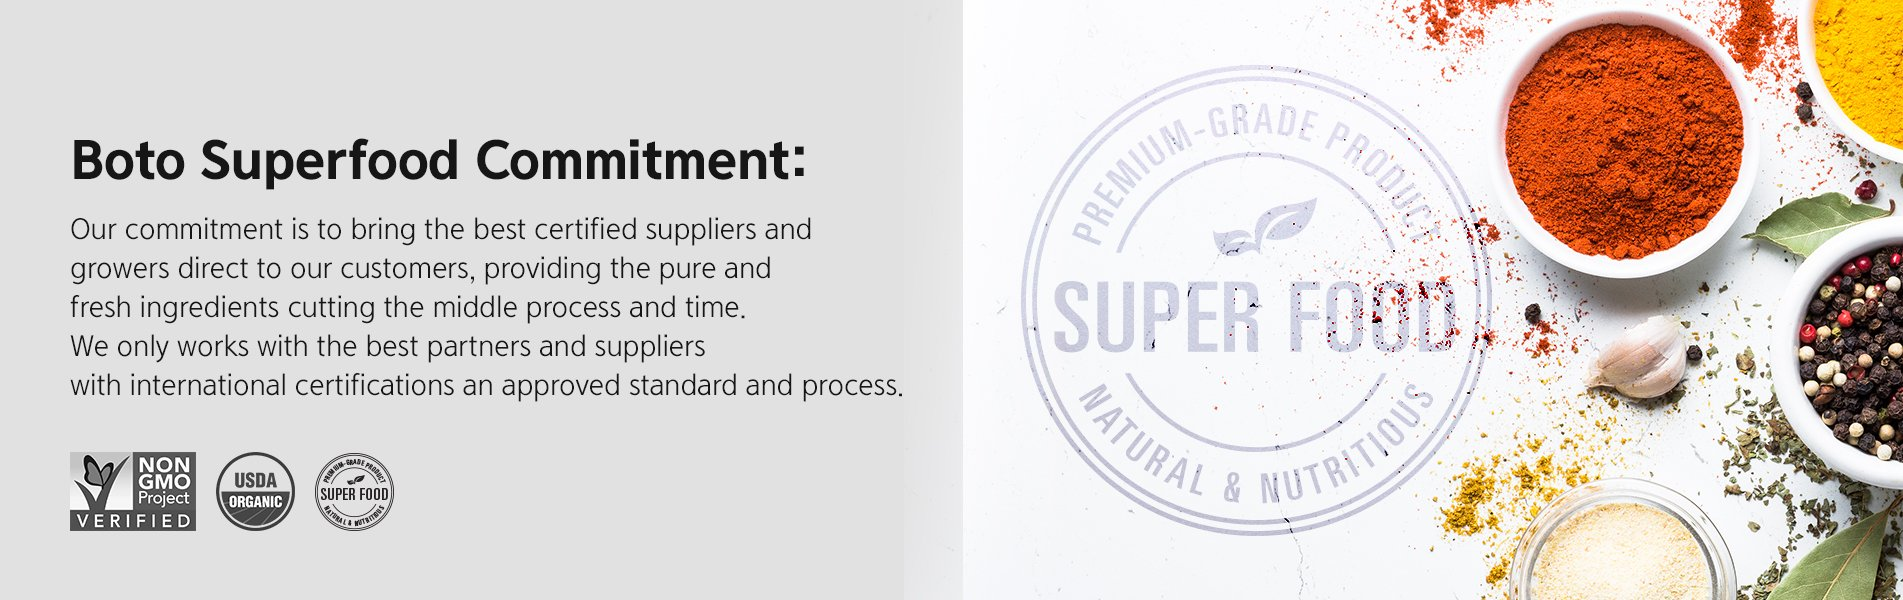 Boto Superfood Aronia Berry Extract Juice - 100% Aronia - Chockeberry - 30 pouch 81.15Fl oz.